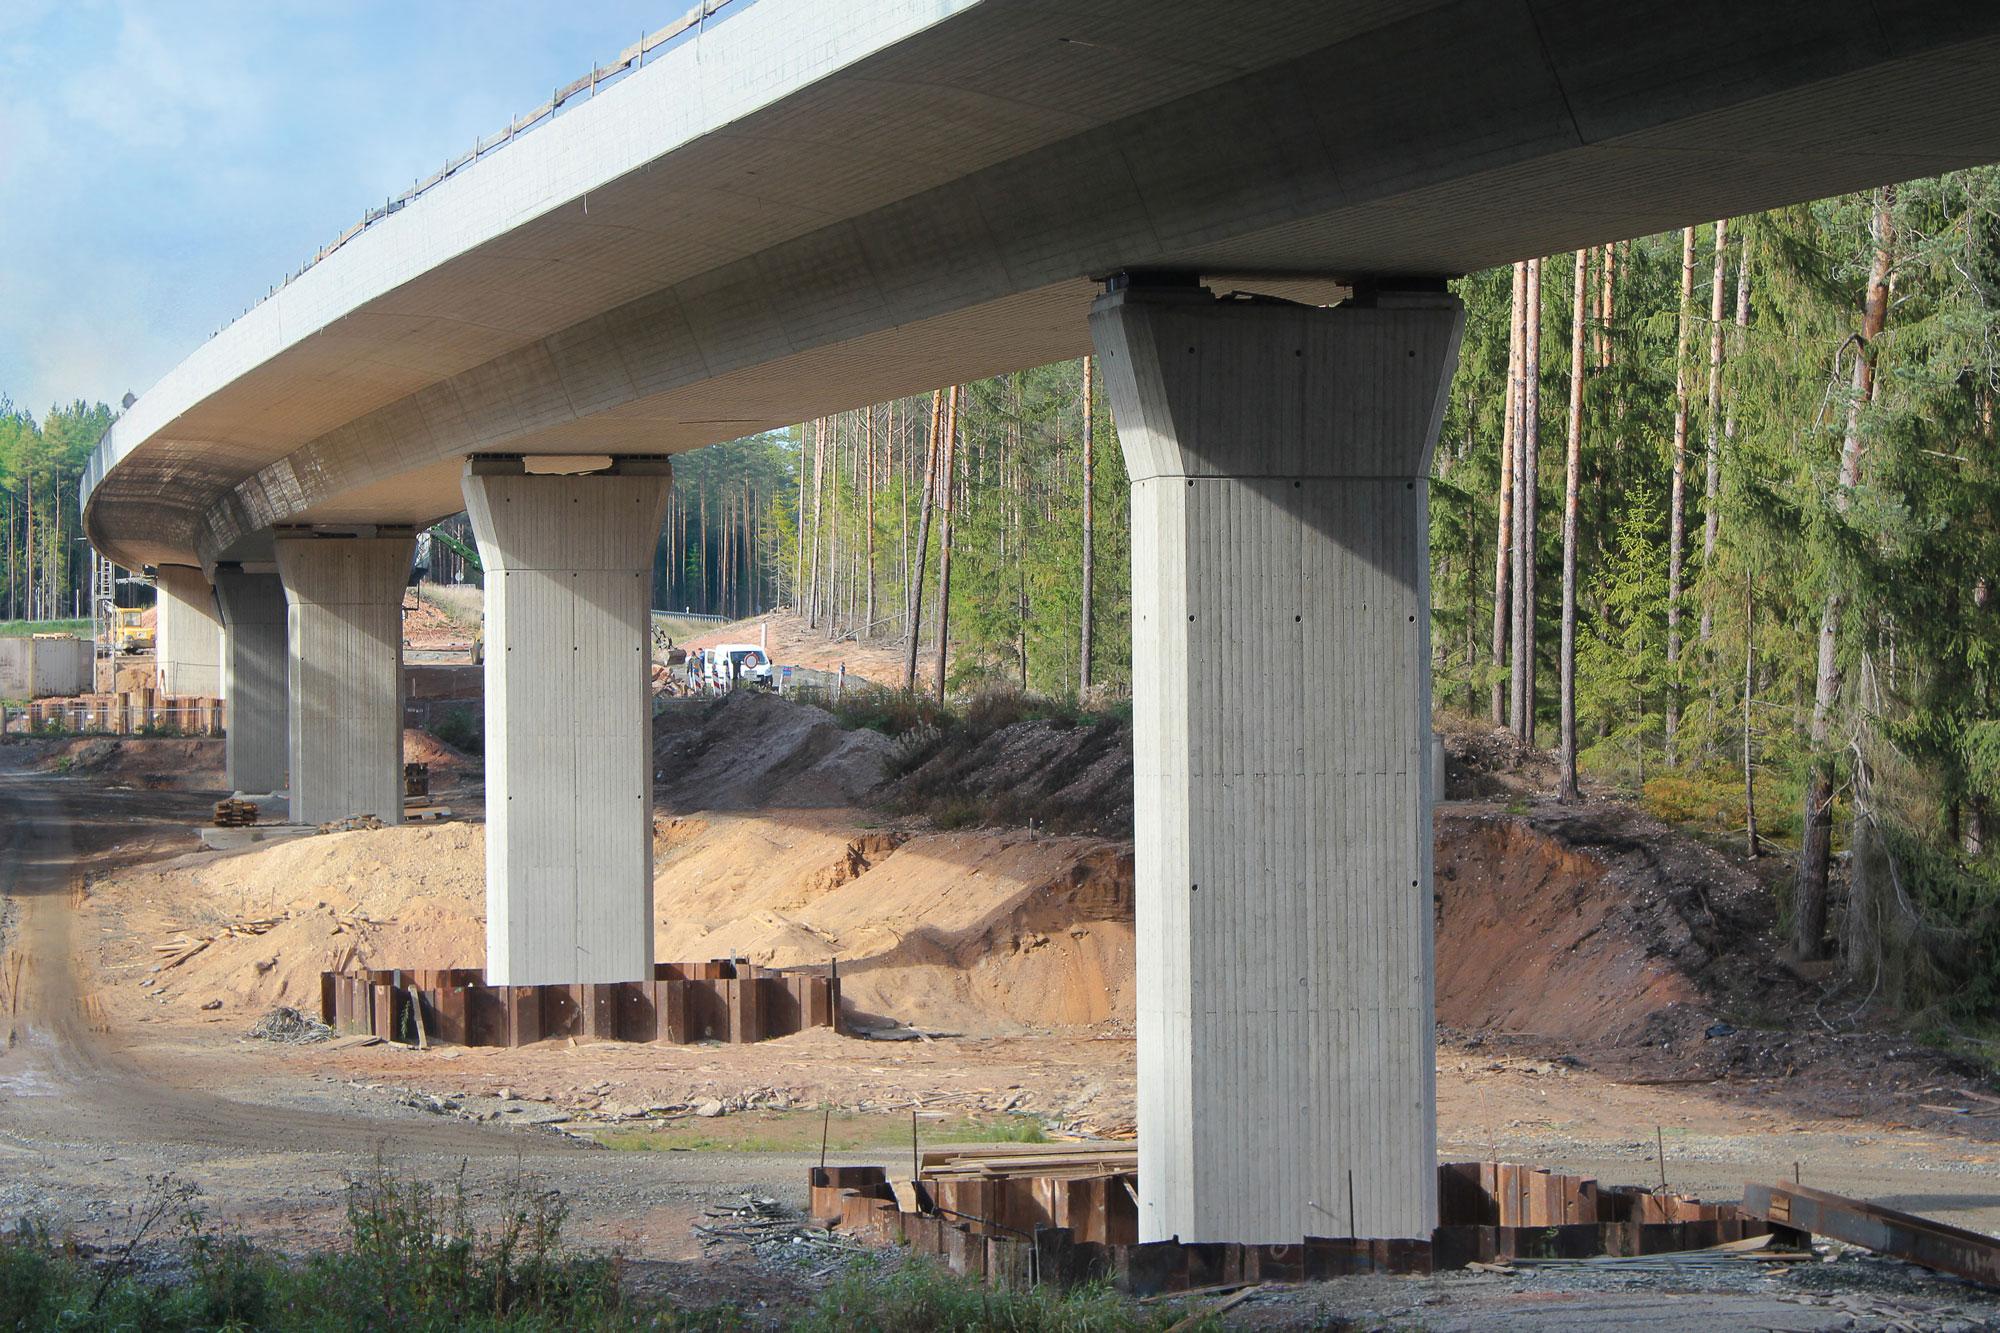 Ortsumfahrung Weiherhammer bei WeidenRöthenbachtalbrücke